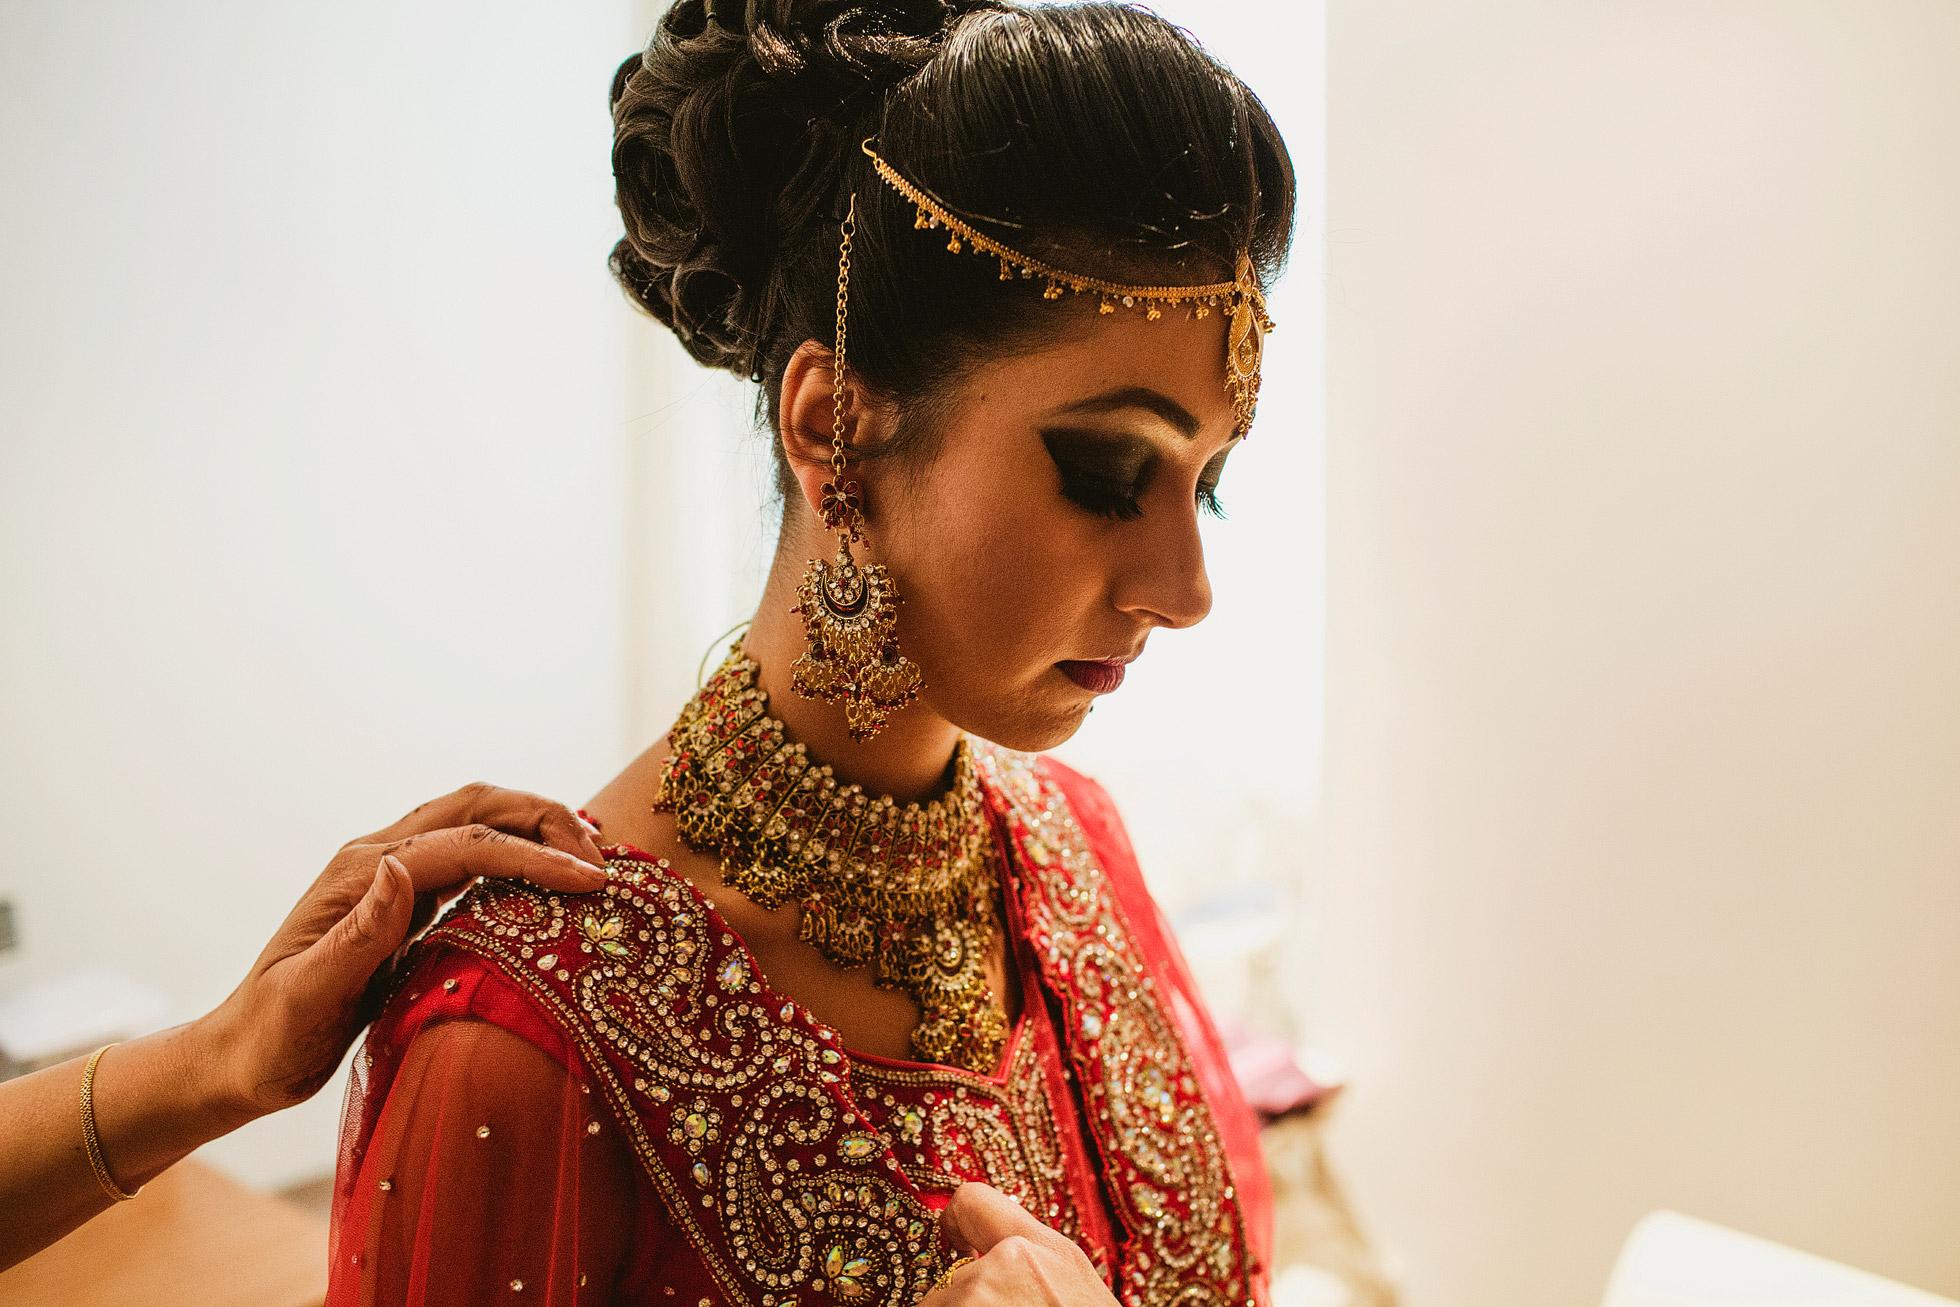 Indian Wedding Bridal Preparations in Harrogate